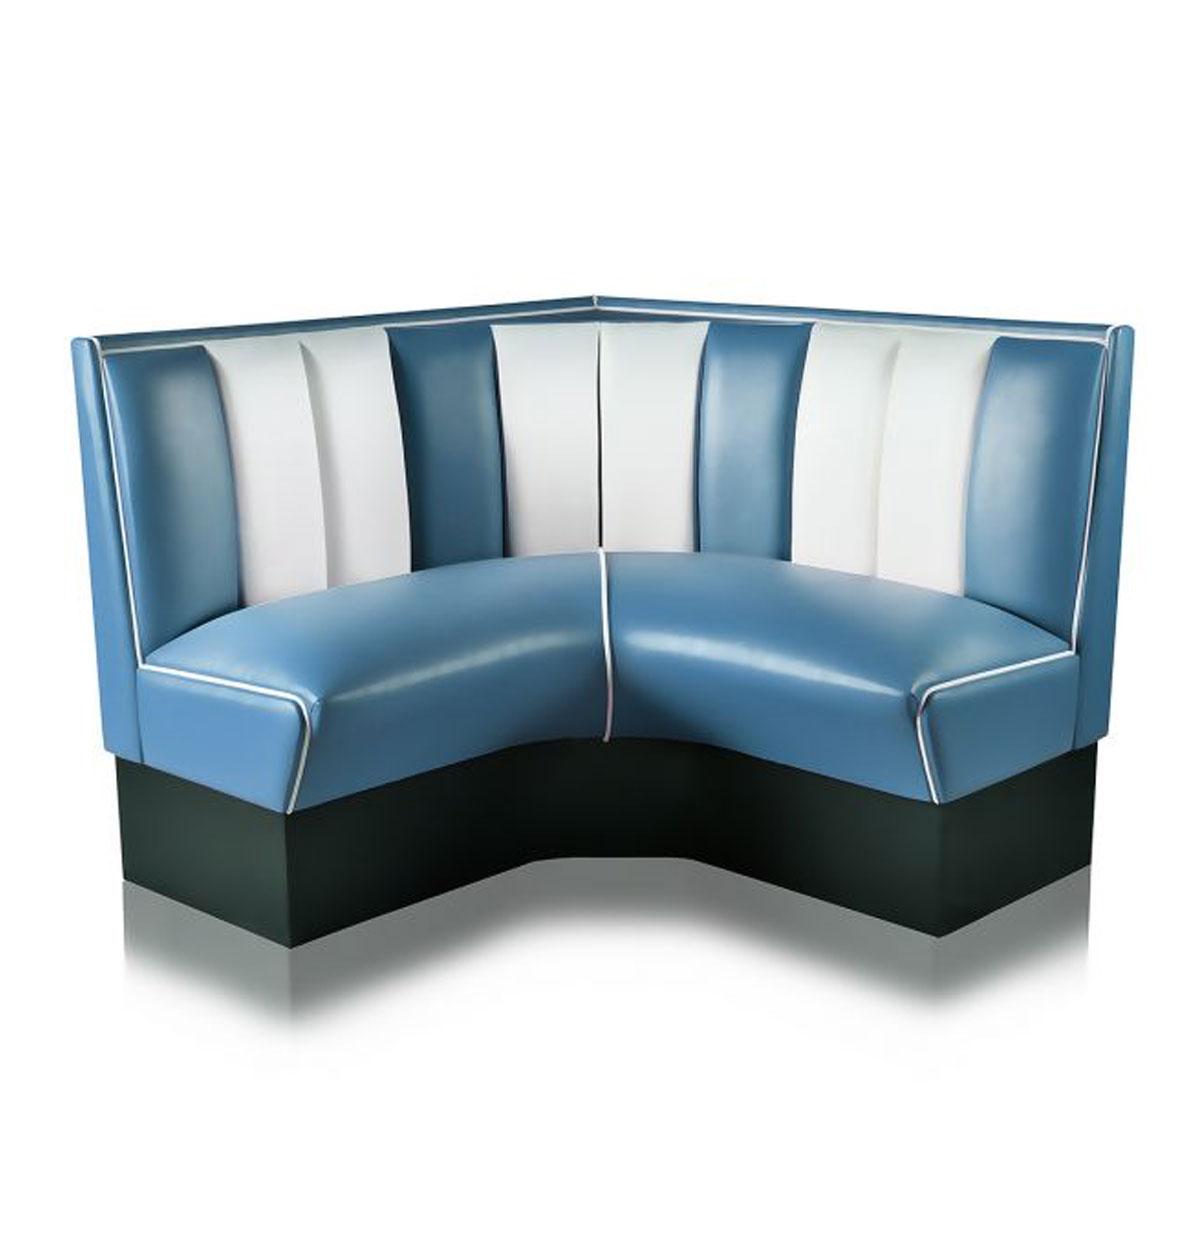 Kwart cirkel Diner Bank 120 cm Blauw